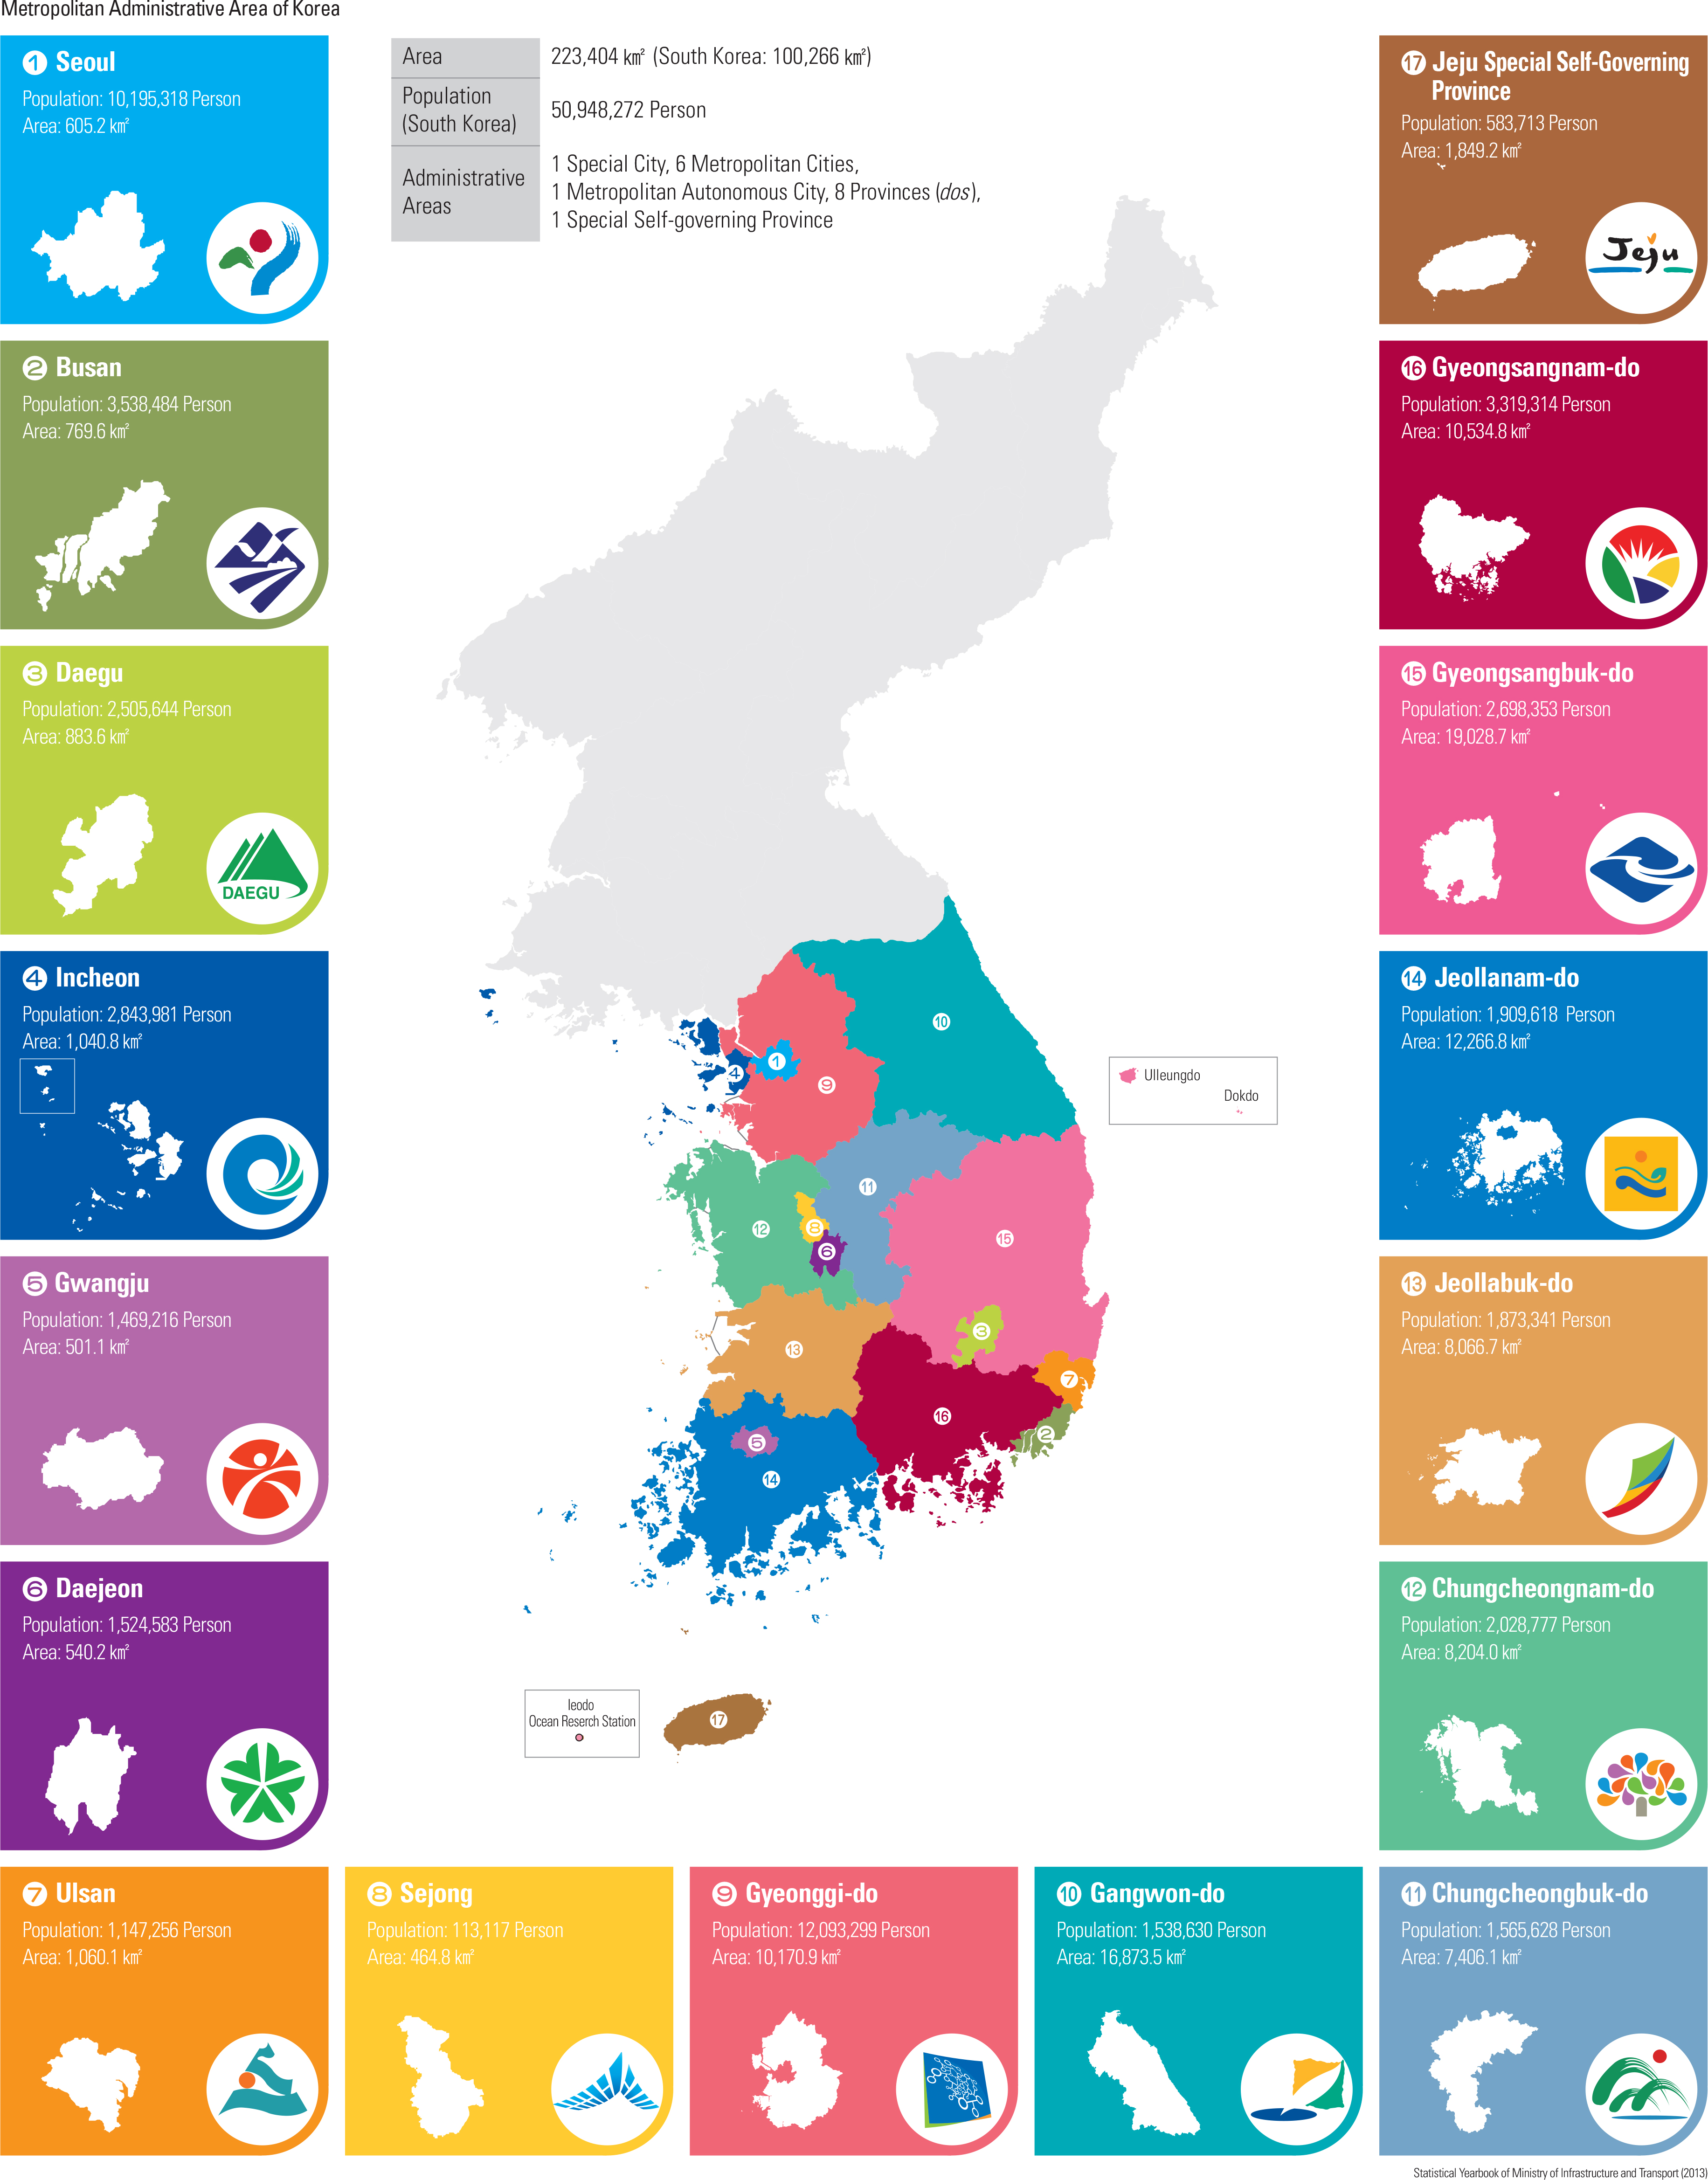 "Metropolitan Administrative Area of Korea<p class=""oz_zoom"" zimg=""http://imagedata.cafe24.com/us_1/us1_7-1_2.jpg""><span style=""font-family:Nanum Myeongjo;""><span style=""font-size:18px;""><span class=""label label-danger"">UPDATE DATA</span></span></p>"